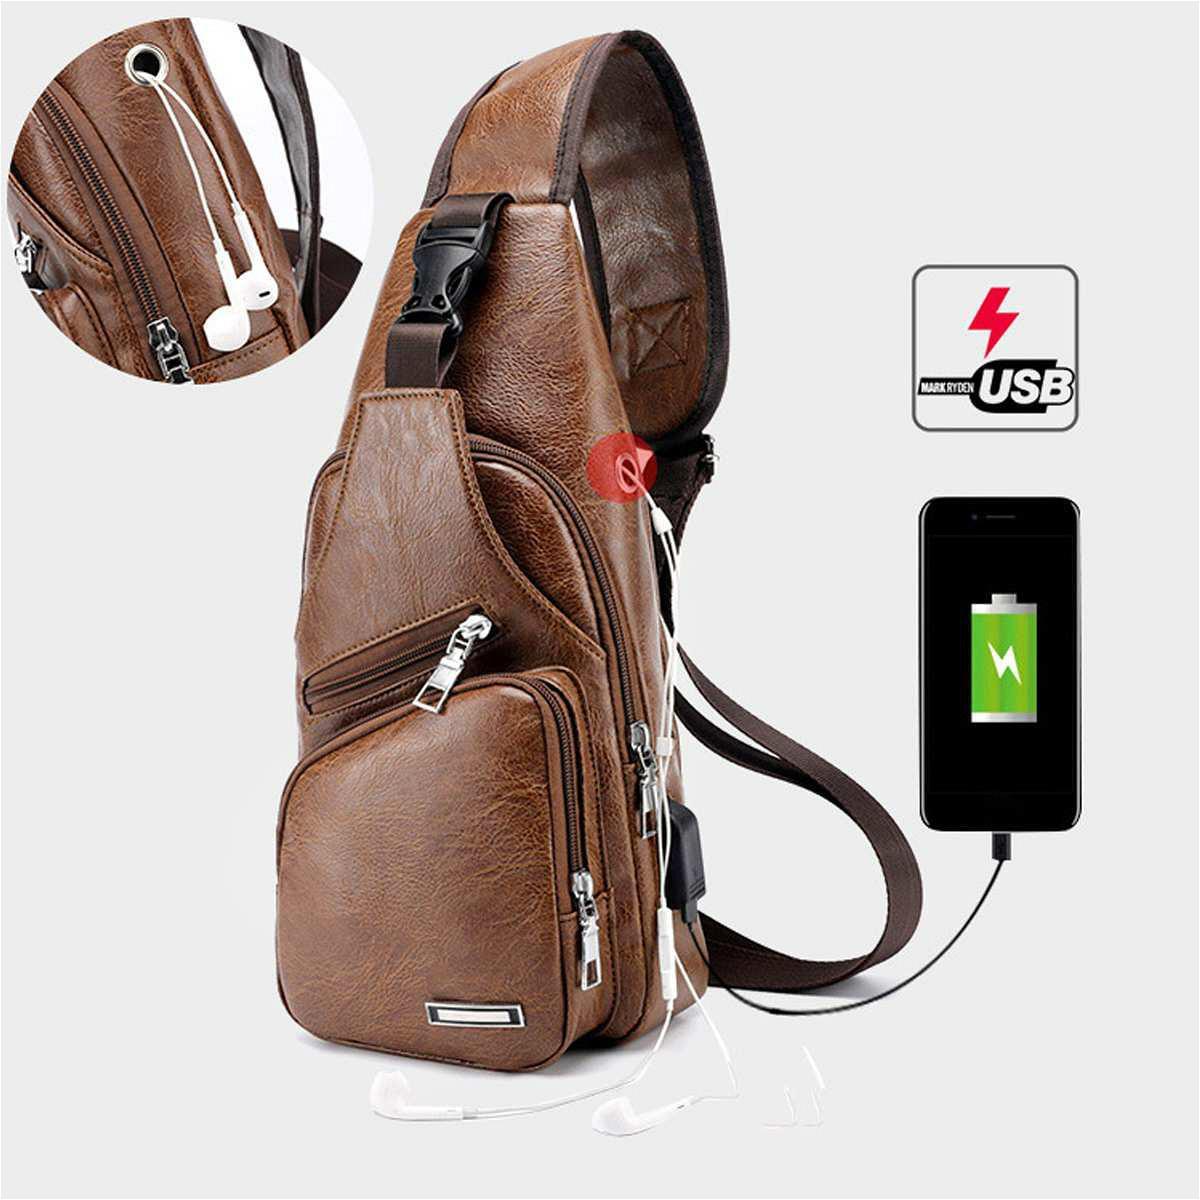 Мужская Crossbody Сумка мужских USB Chest сумка Конструктор Сумка из кожи сумка плечи Diagonal пакет NEW Рюкзак для путешествий